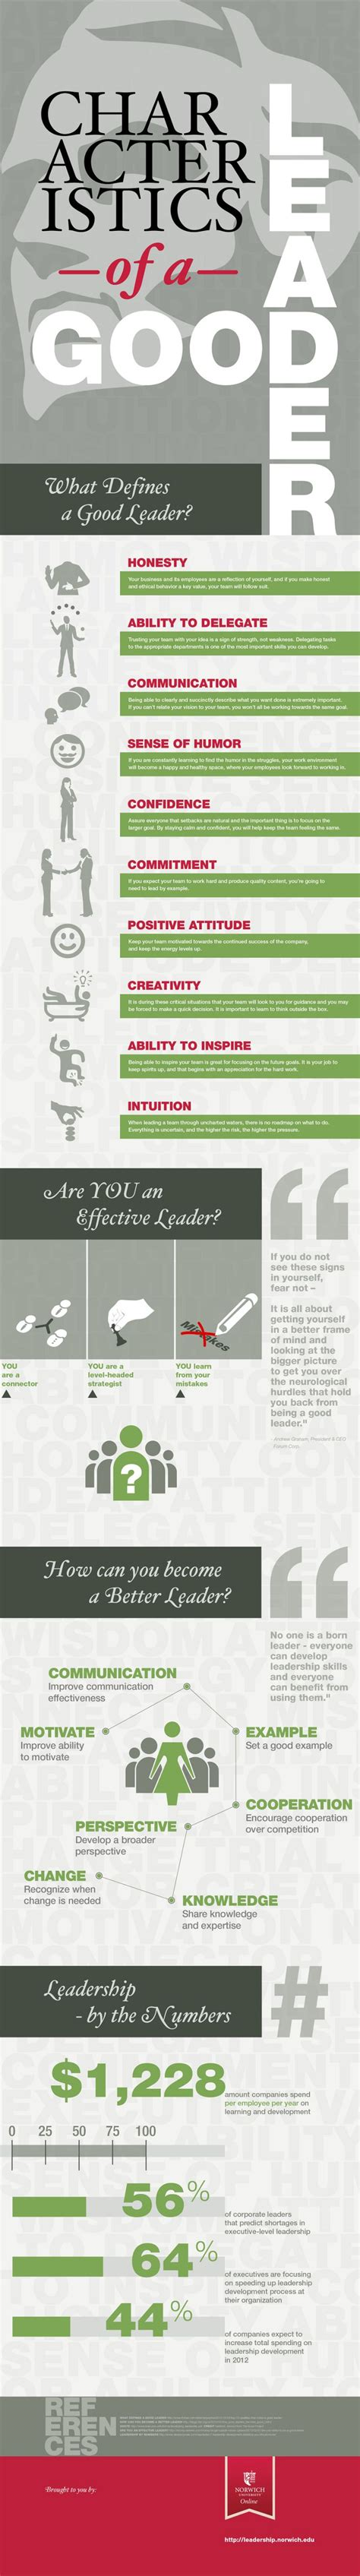 leadership training advanced business coaching